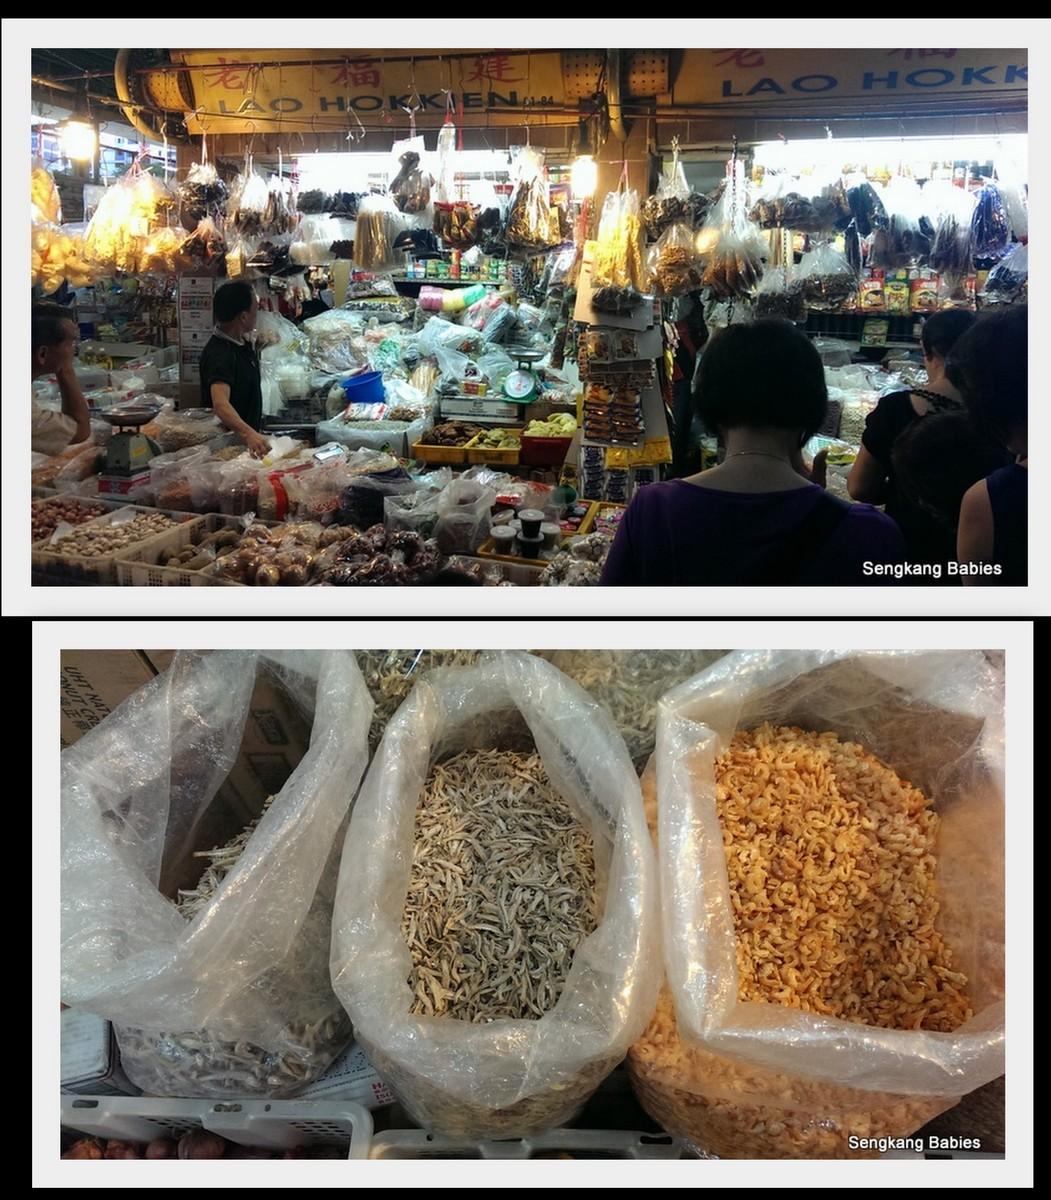 SengkangBabies wet market